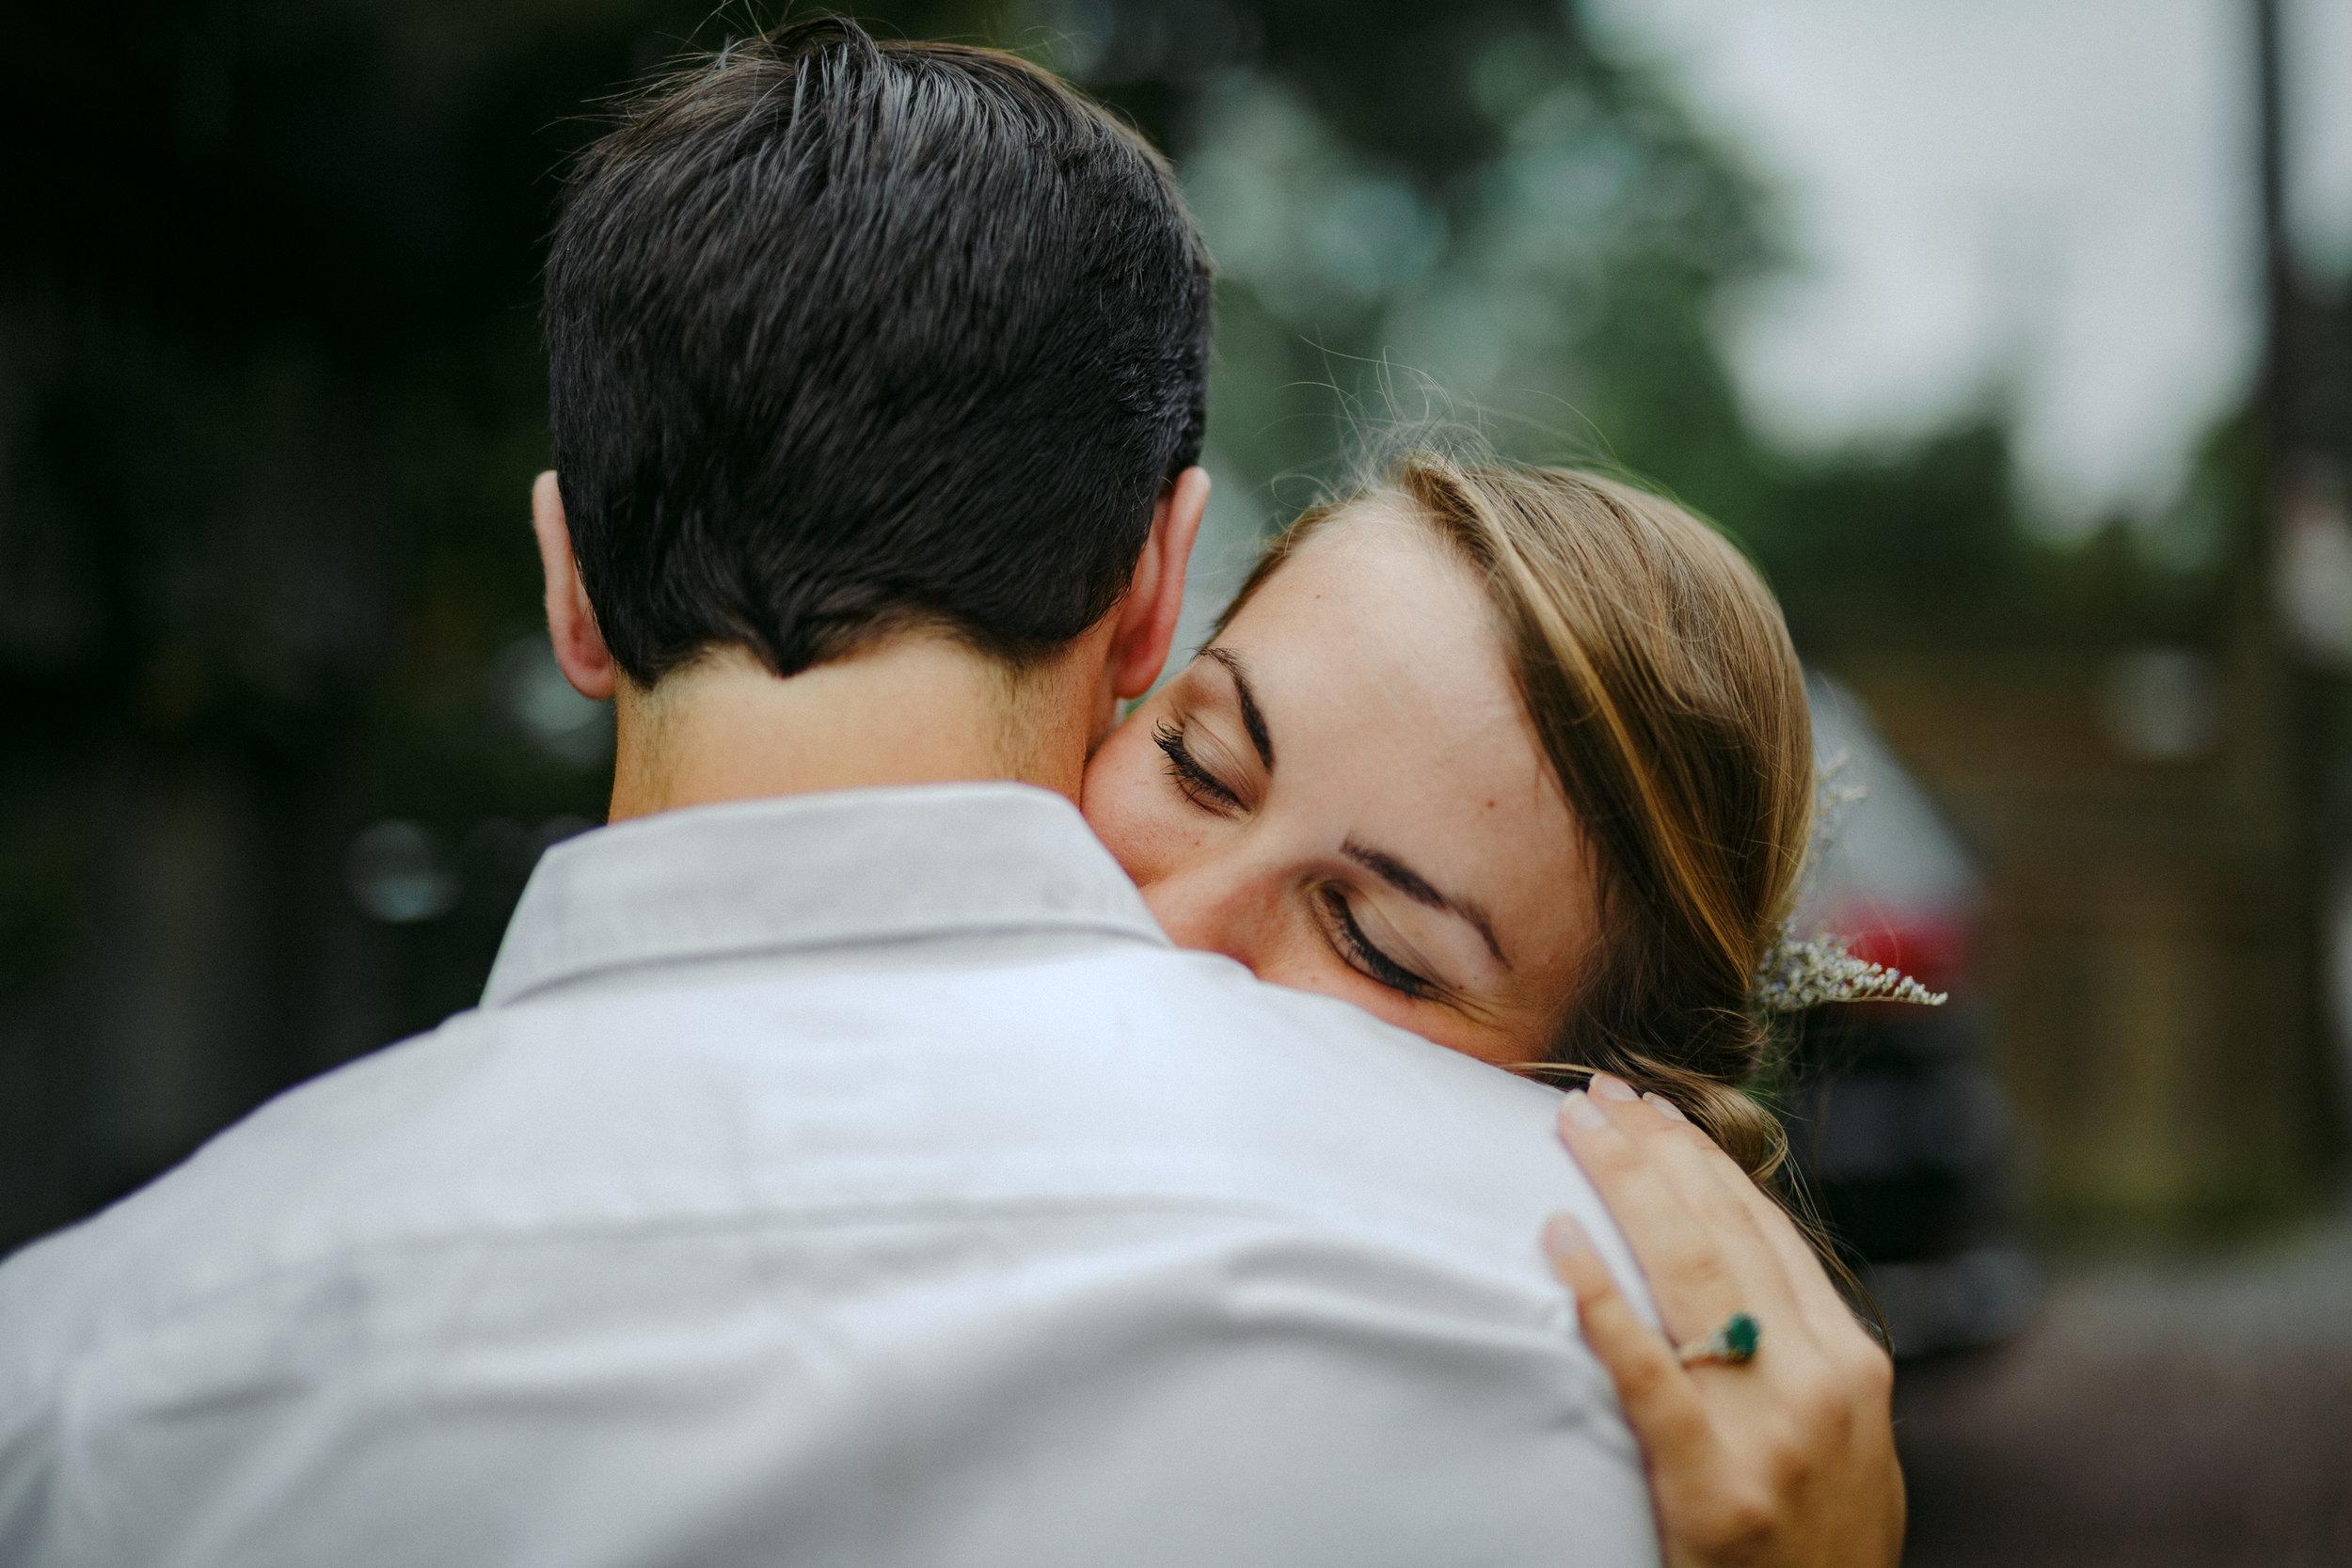 richmond_wedding_photographer-6.jpg